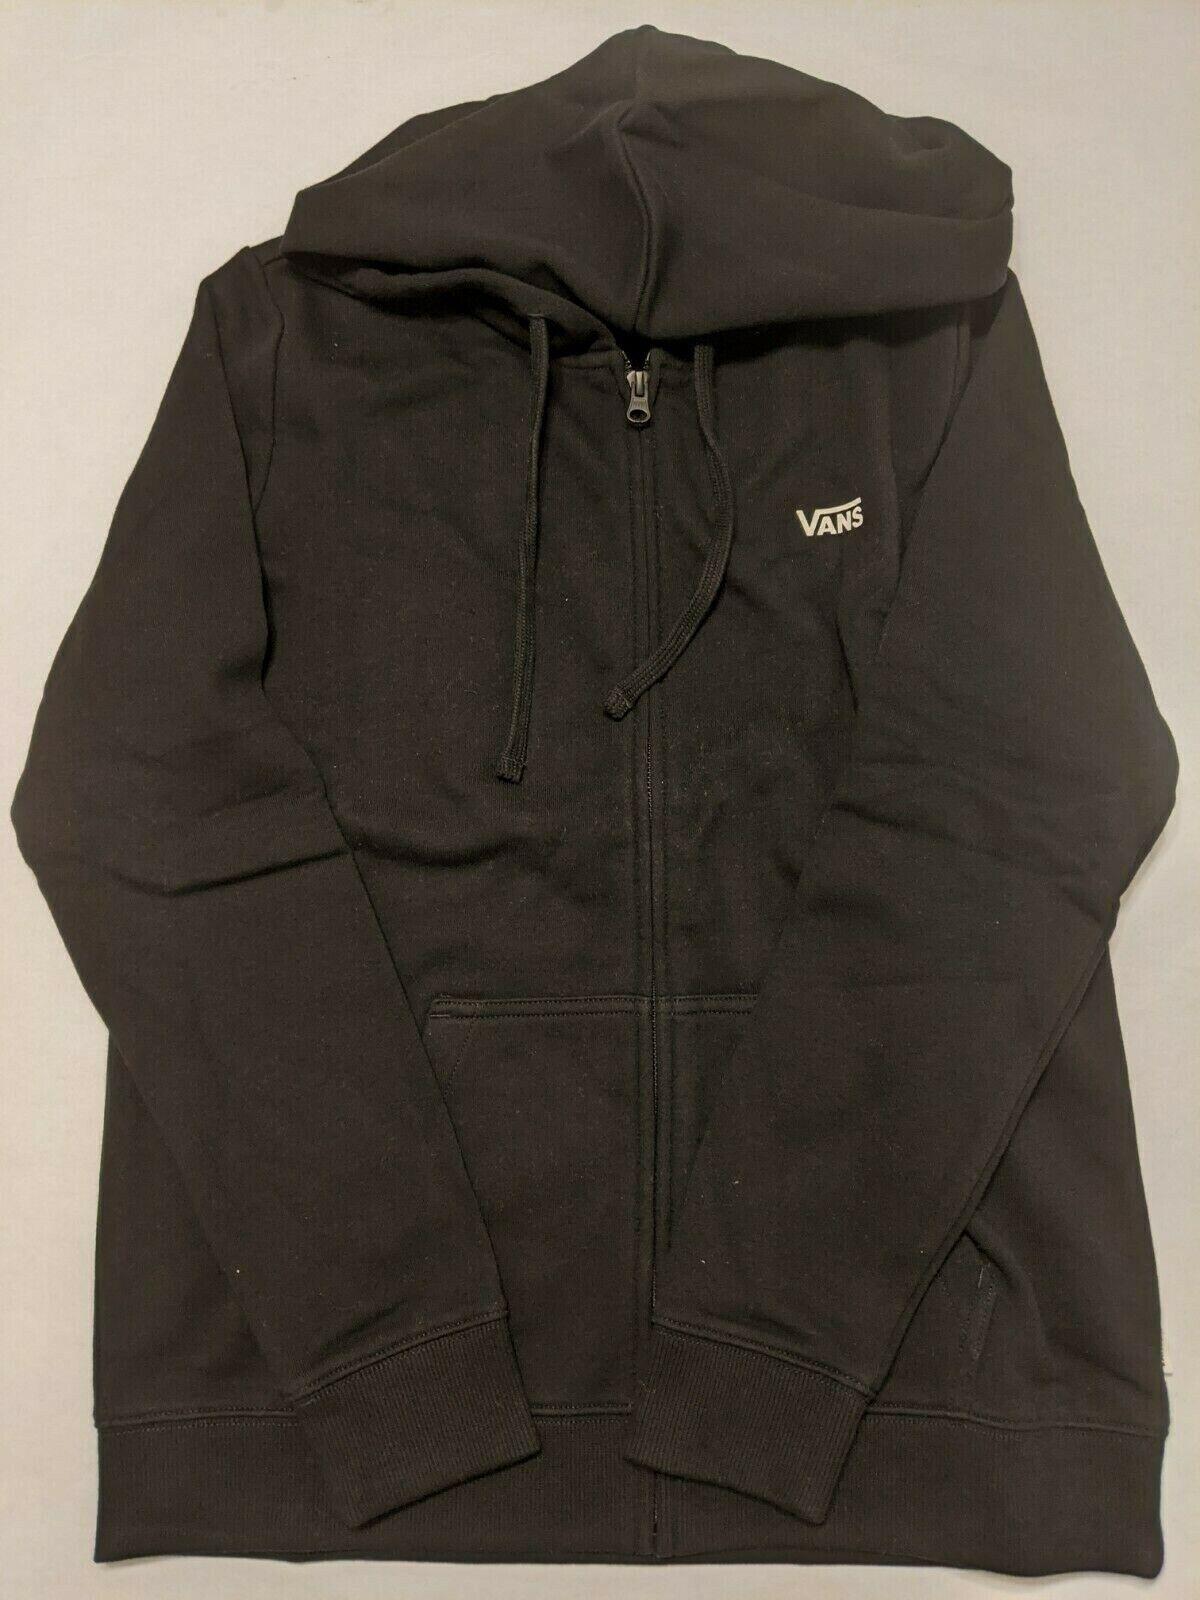 Vans Sweatshirt Women's Small New Classic V Full Zip Black Hoodie